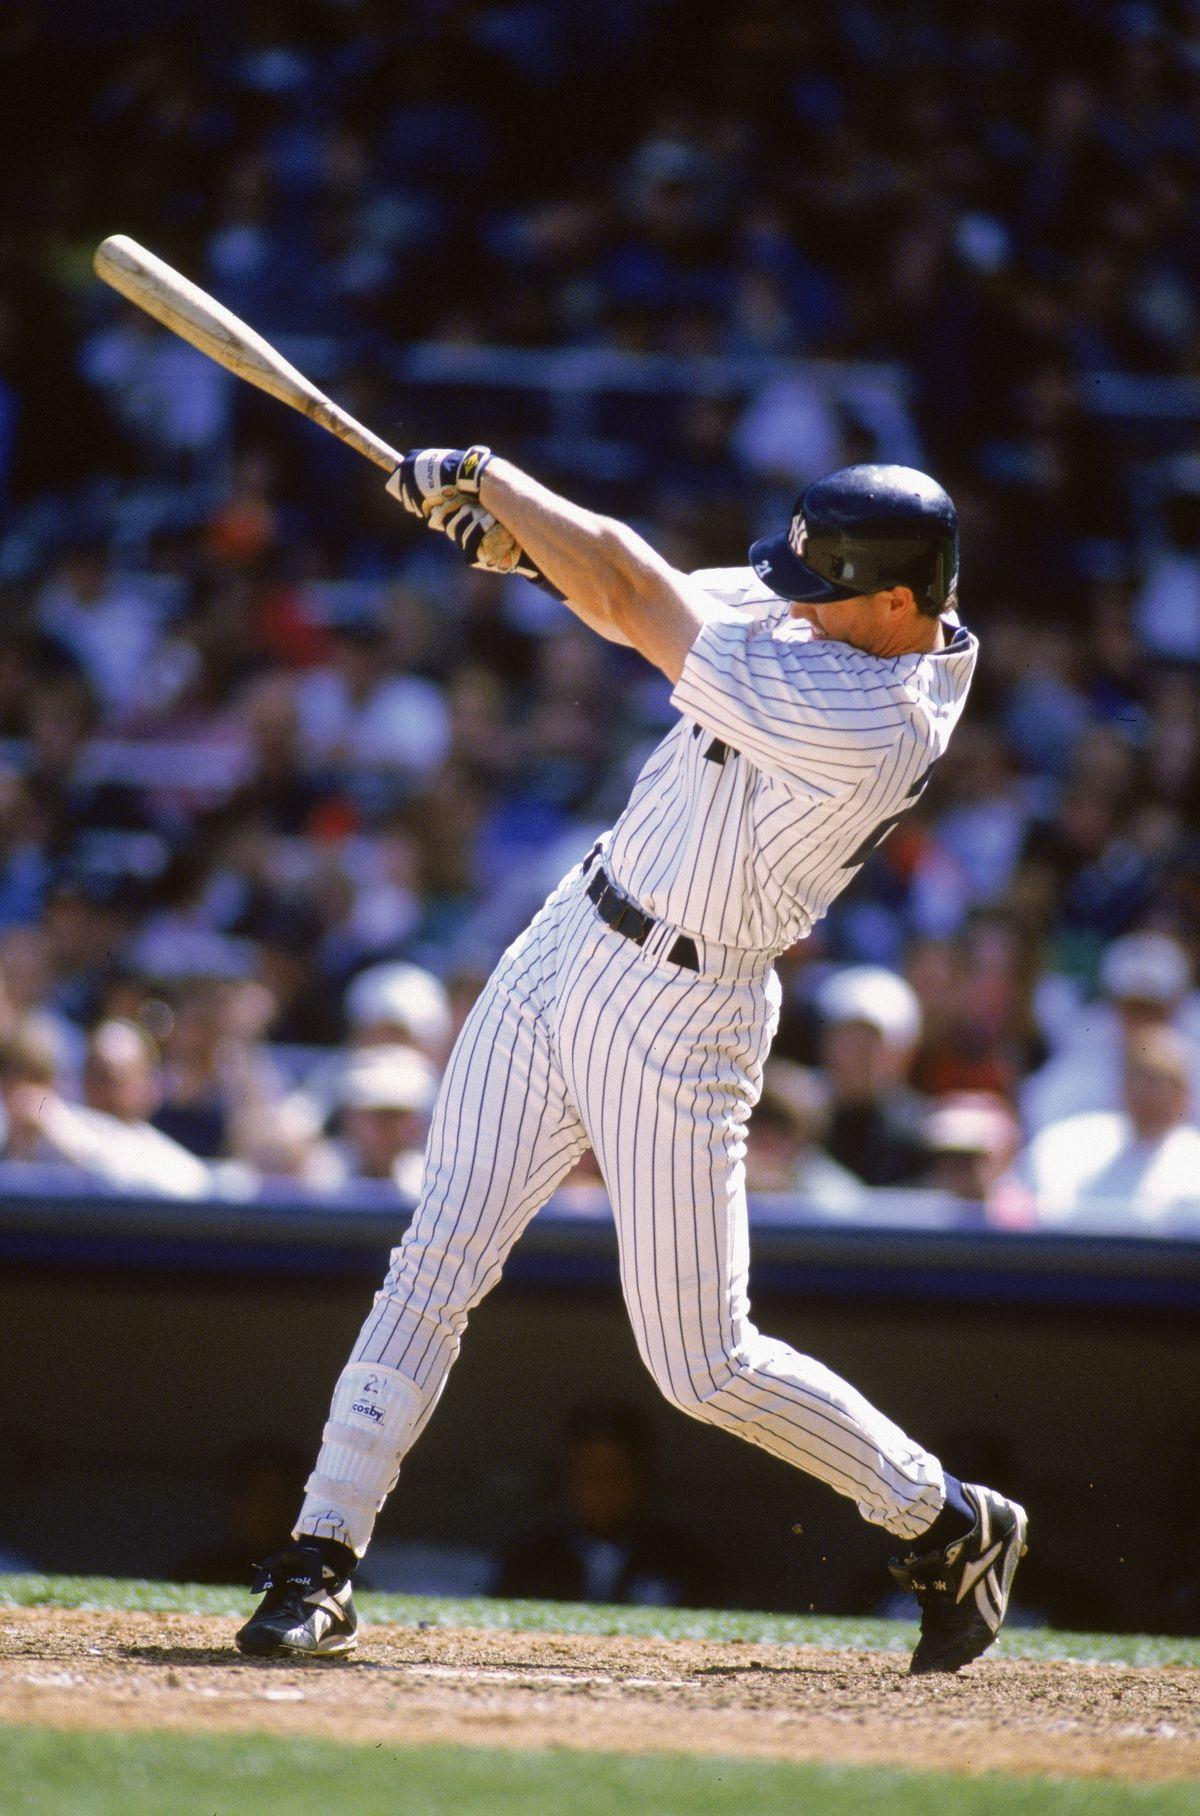 MLB Photos Archive